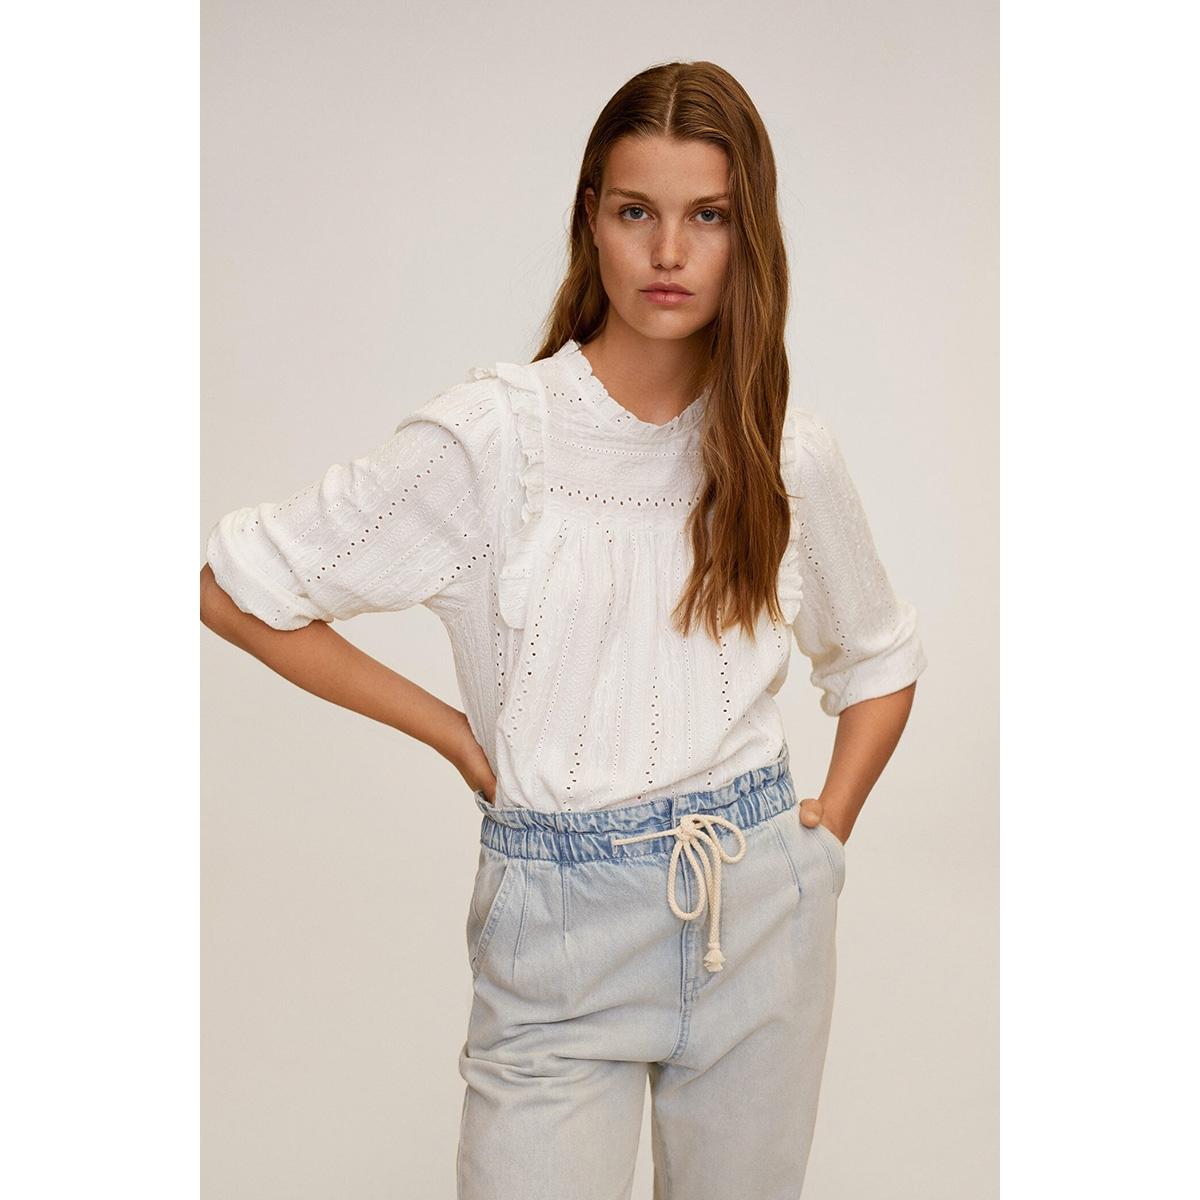 opengewerkte blouse met ruches 67009221 mango blouse 02